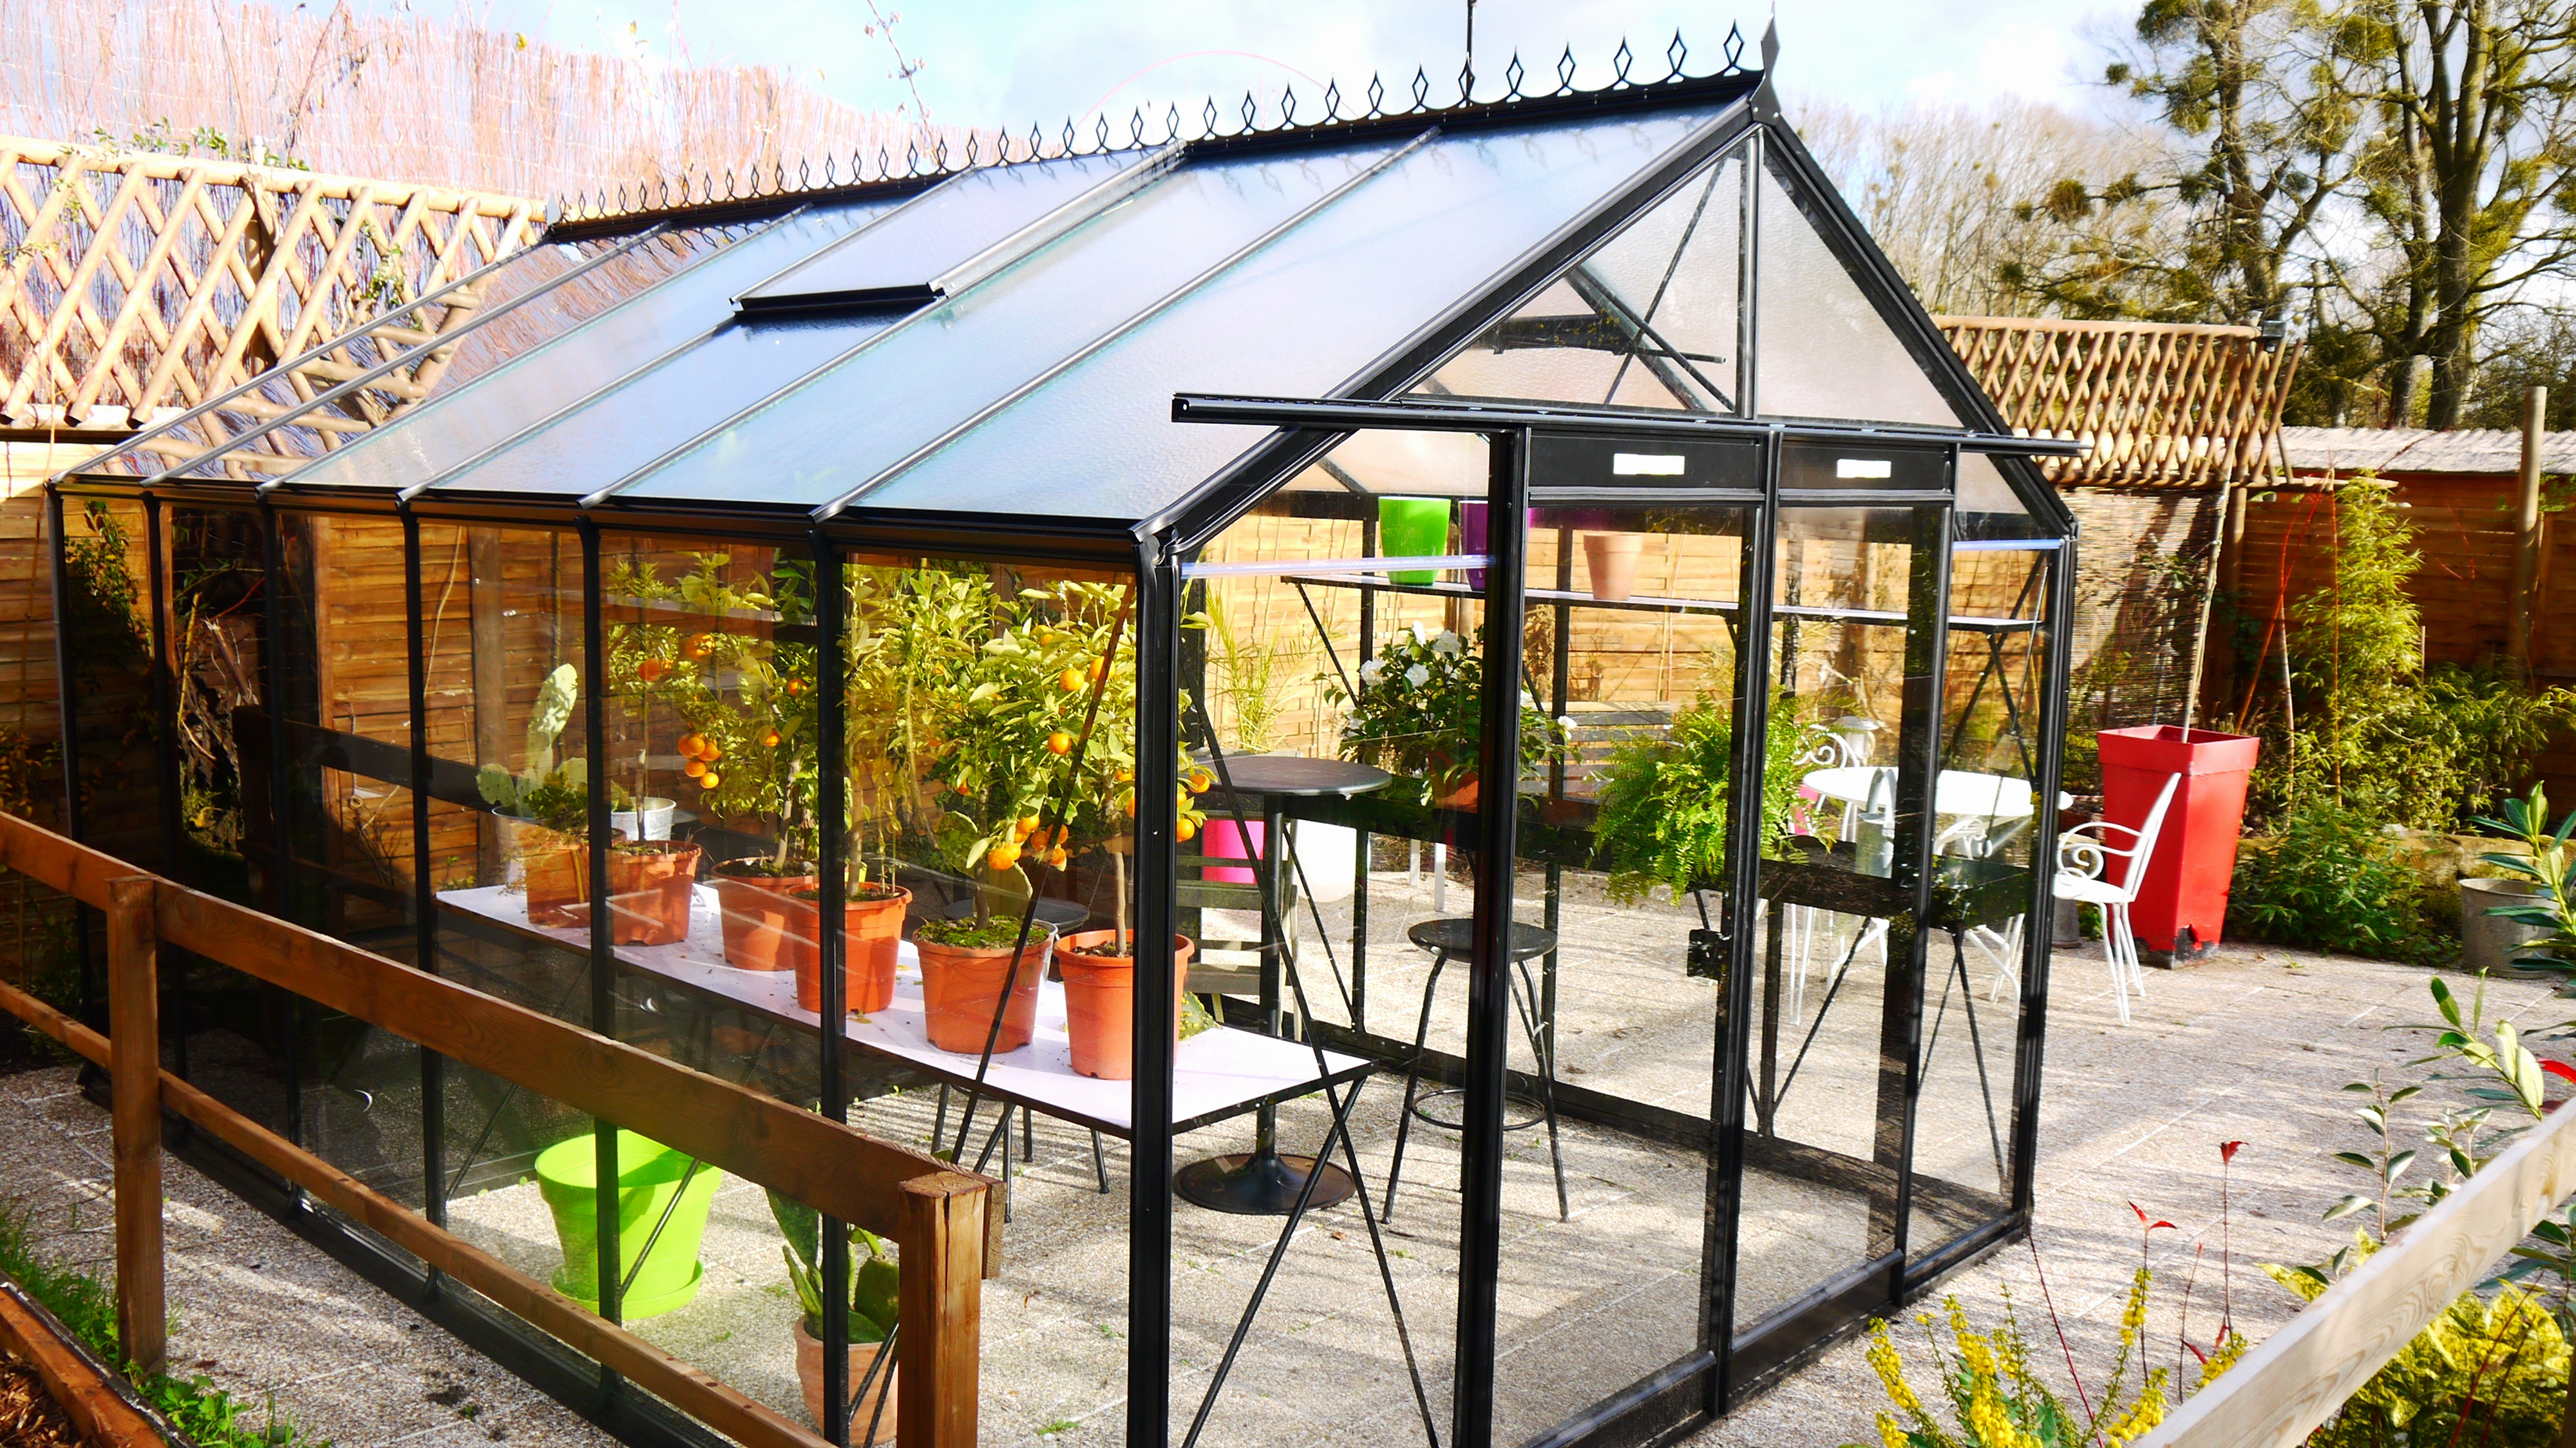 Fabriquer Serre De Jardin Polycarbonate Luxe Photos Serres De Jardin Polycarbonate Meilleur De Fabriquer Serre De Jardin